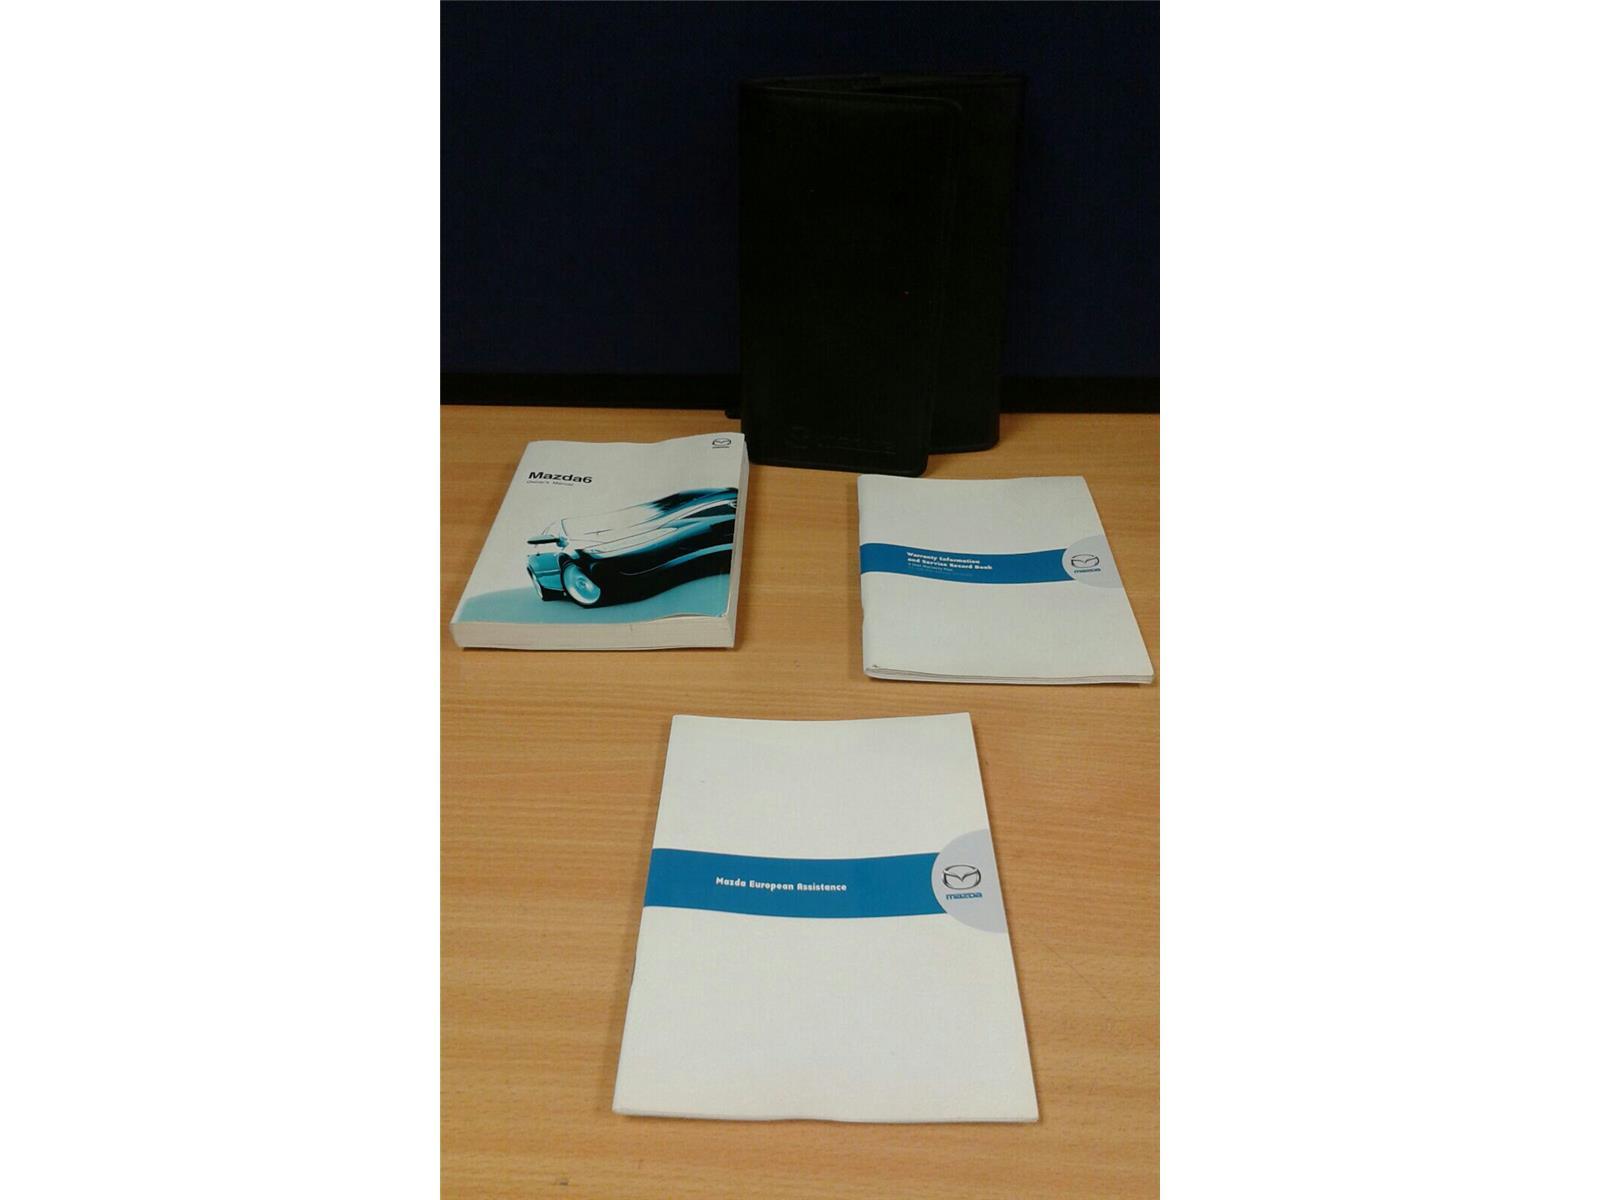 mazda 6 2002 to 2007 book pack petrol manual for sale from rh motorhog co uk Mazda SUV mazda 6 2002 owners manual pdf